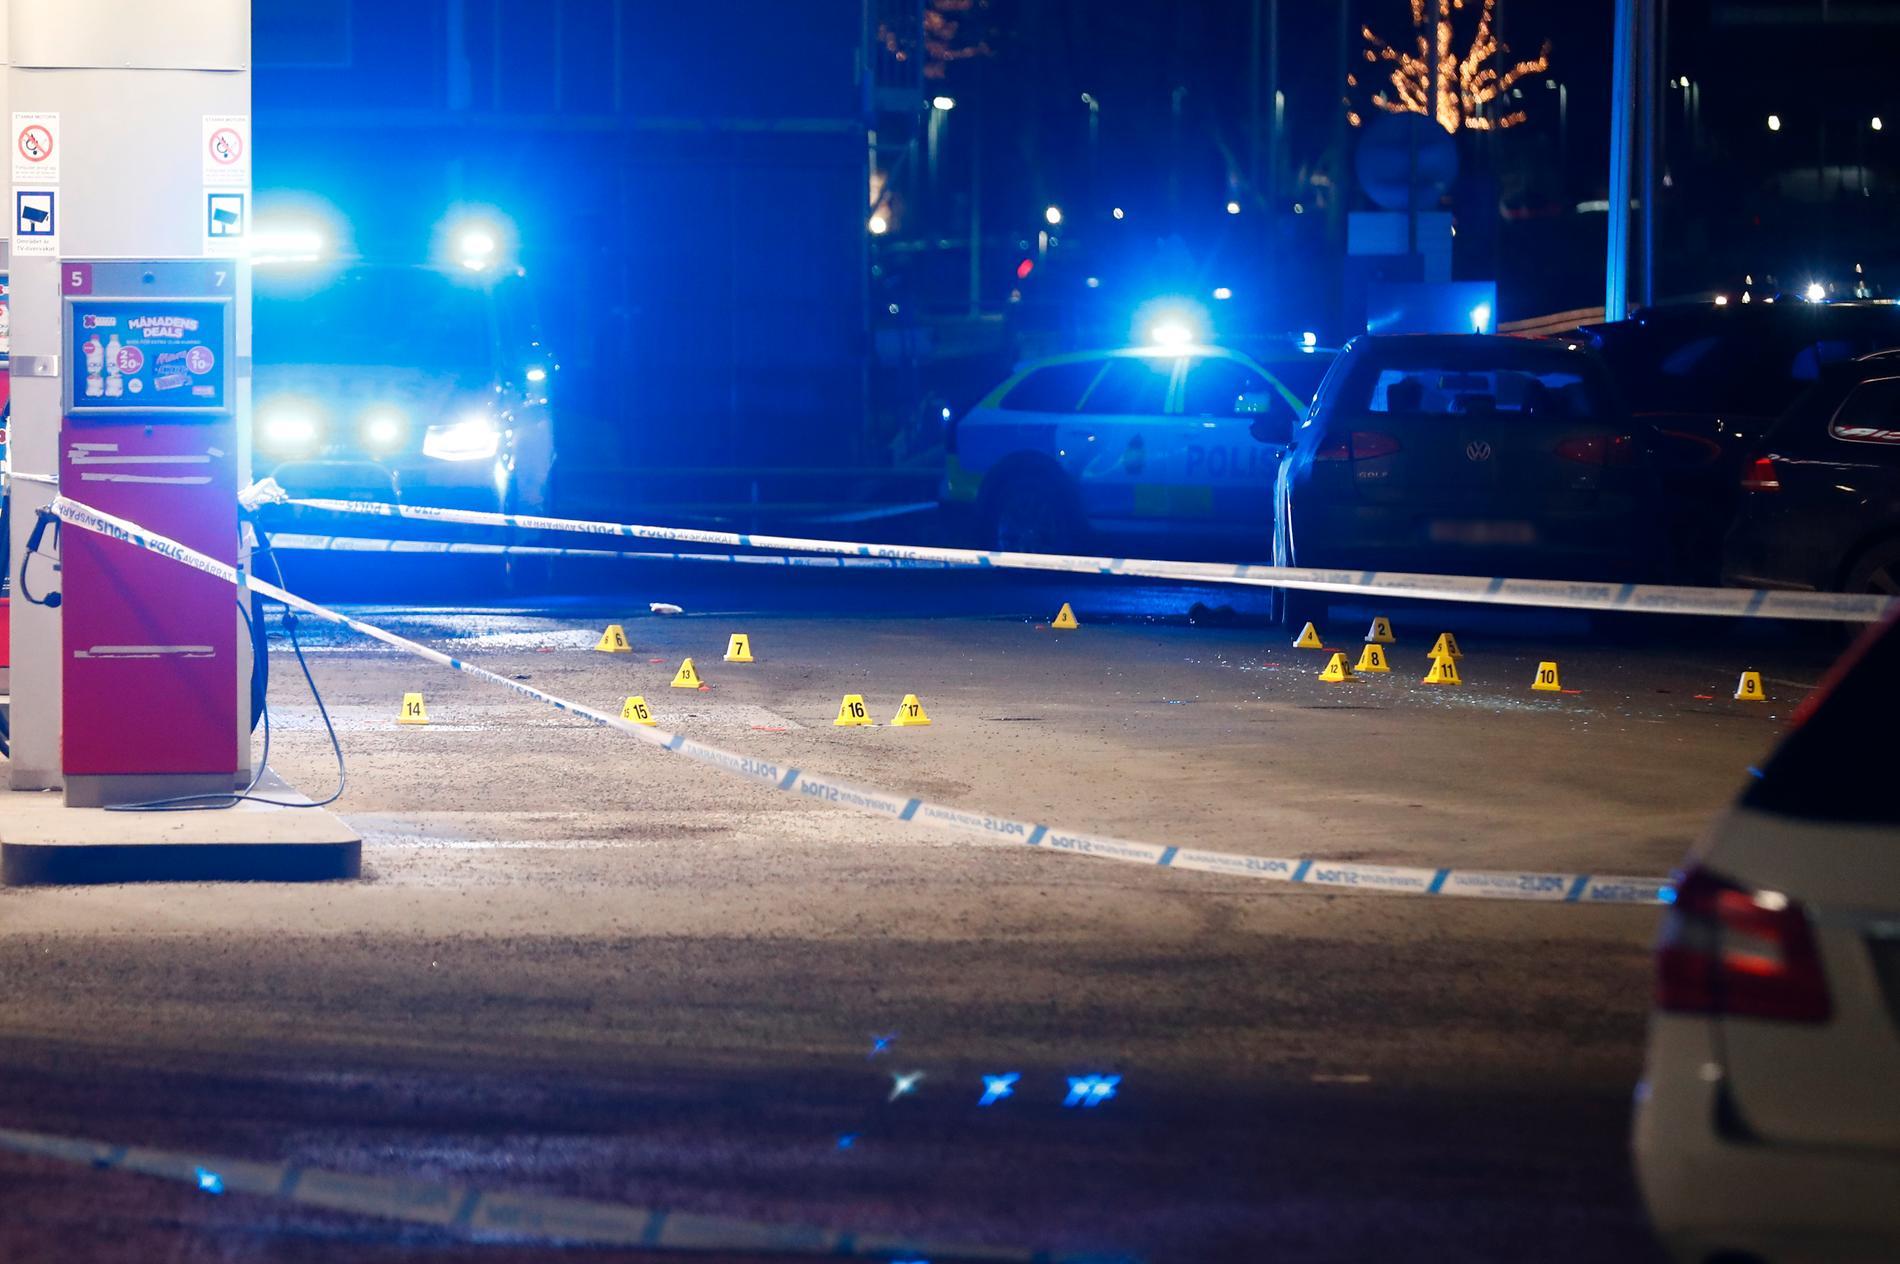 Skjutningen skedde på en bensinmack i Kungens kurva i Stockholm.